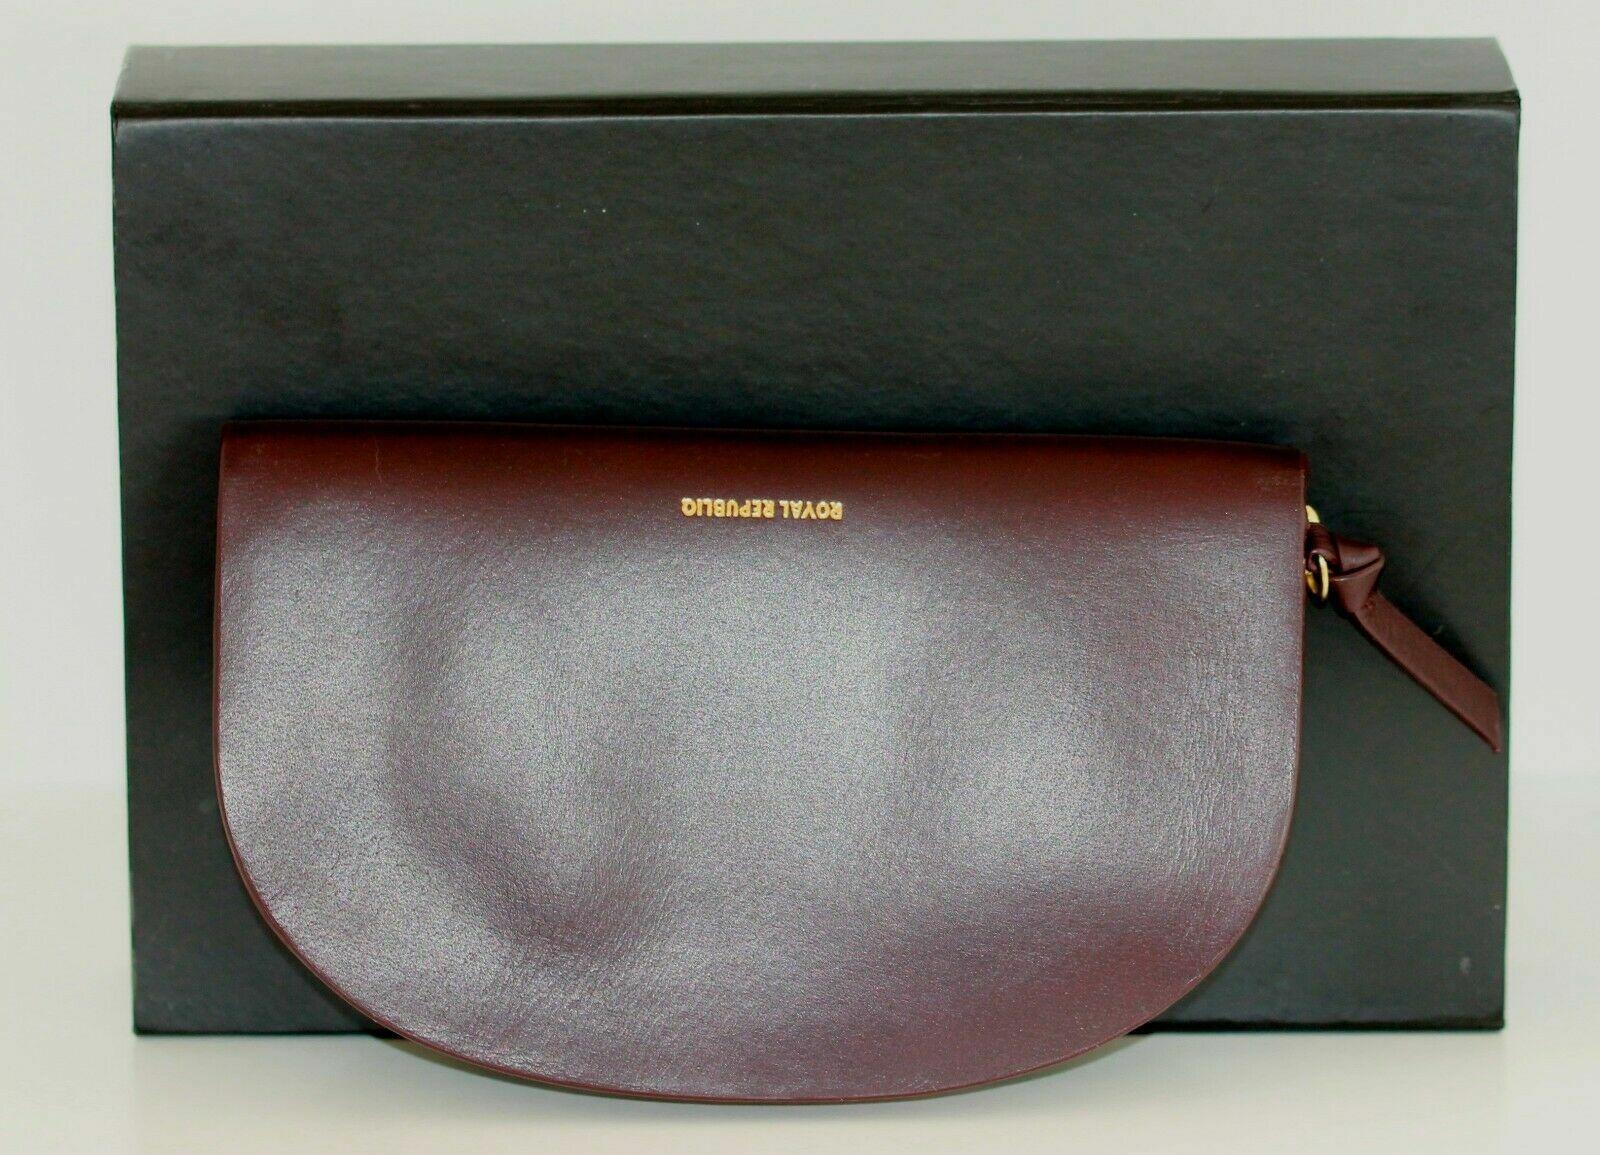 Royal republiq Purse Leather 'Galax curves' Bordeaux NWT